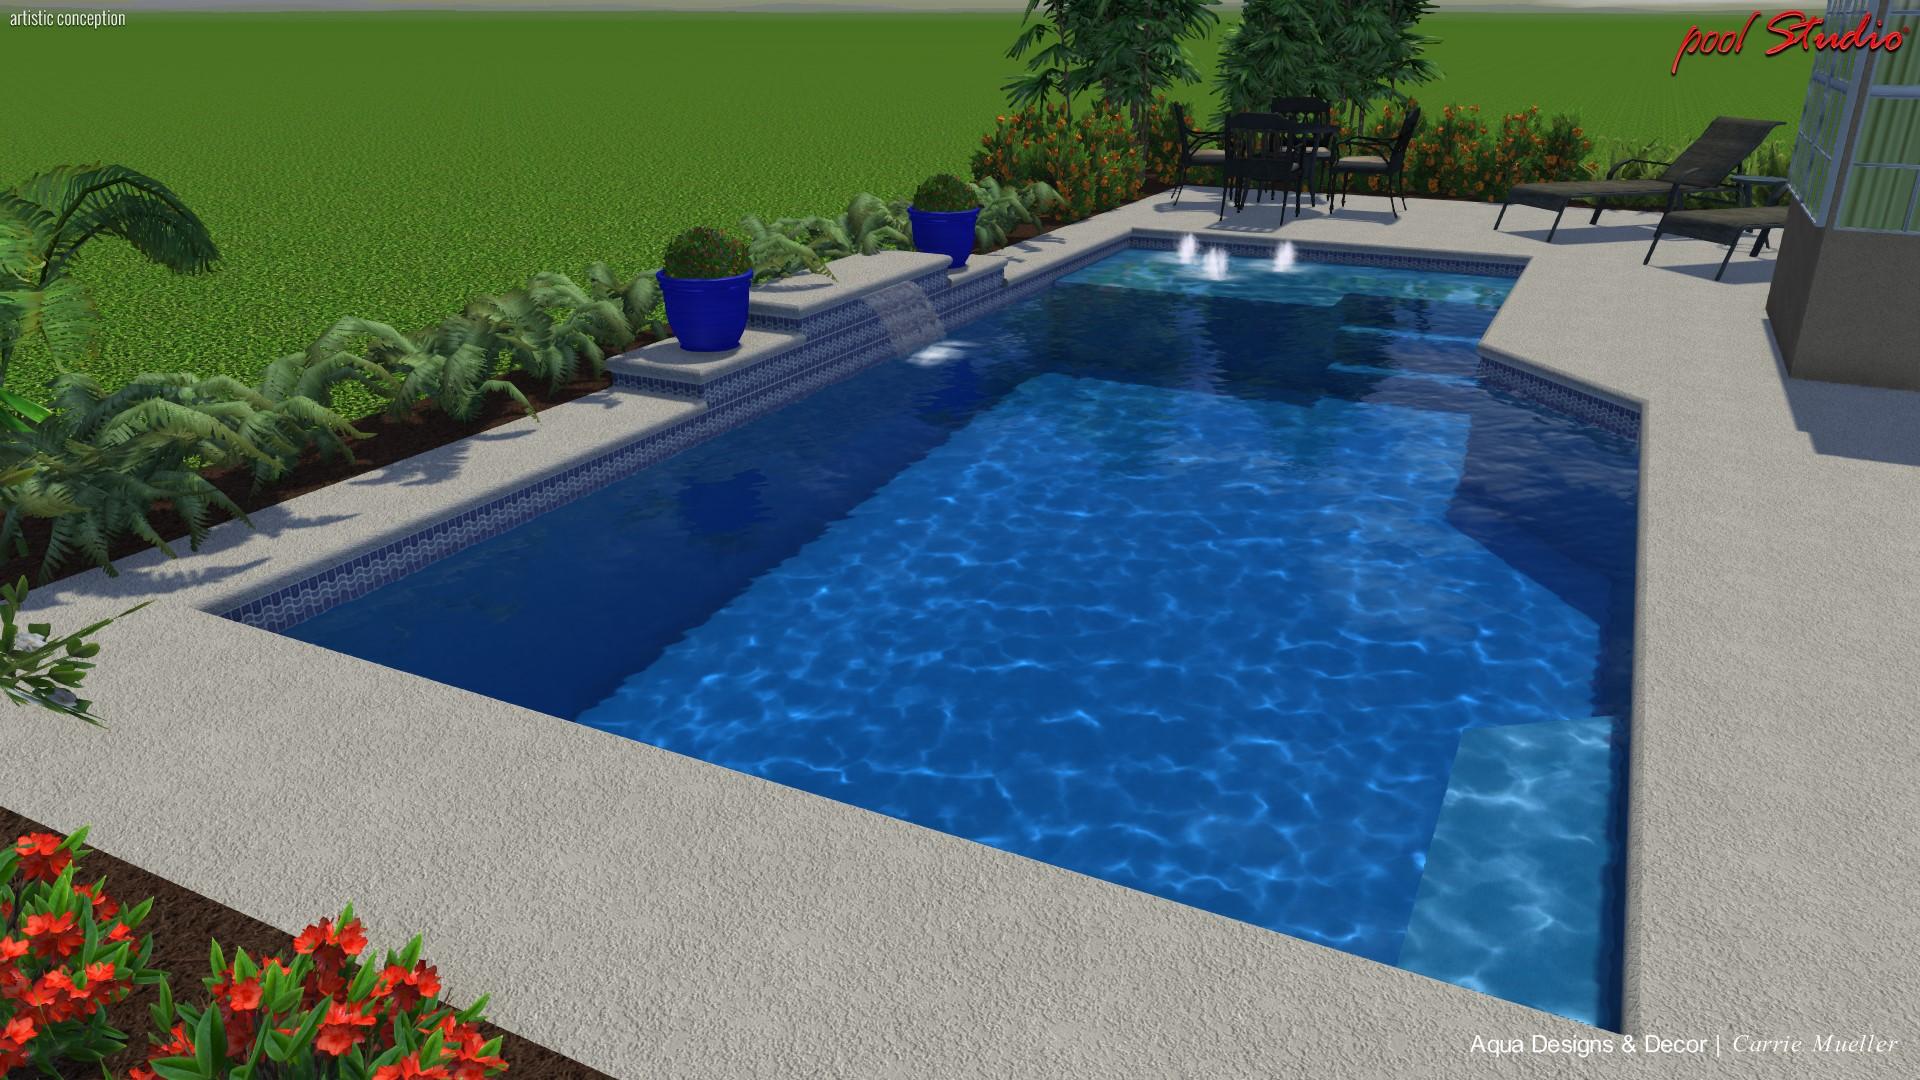 Aqua Designs & Decor of Bradenton, Fl : Custom Pool Designs